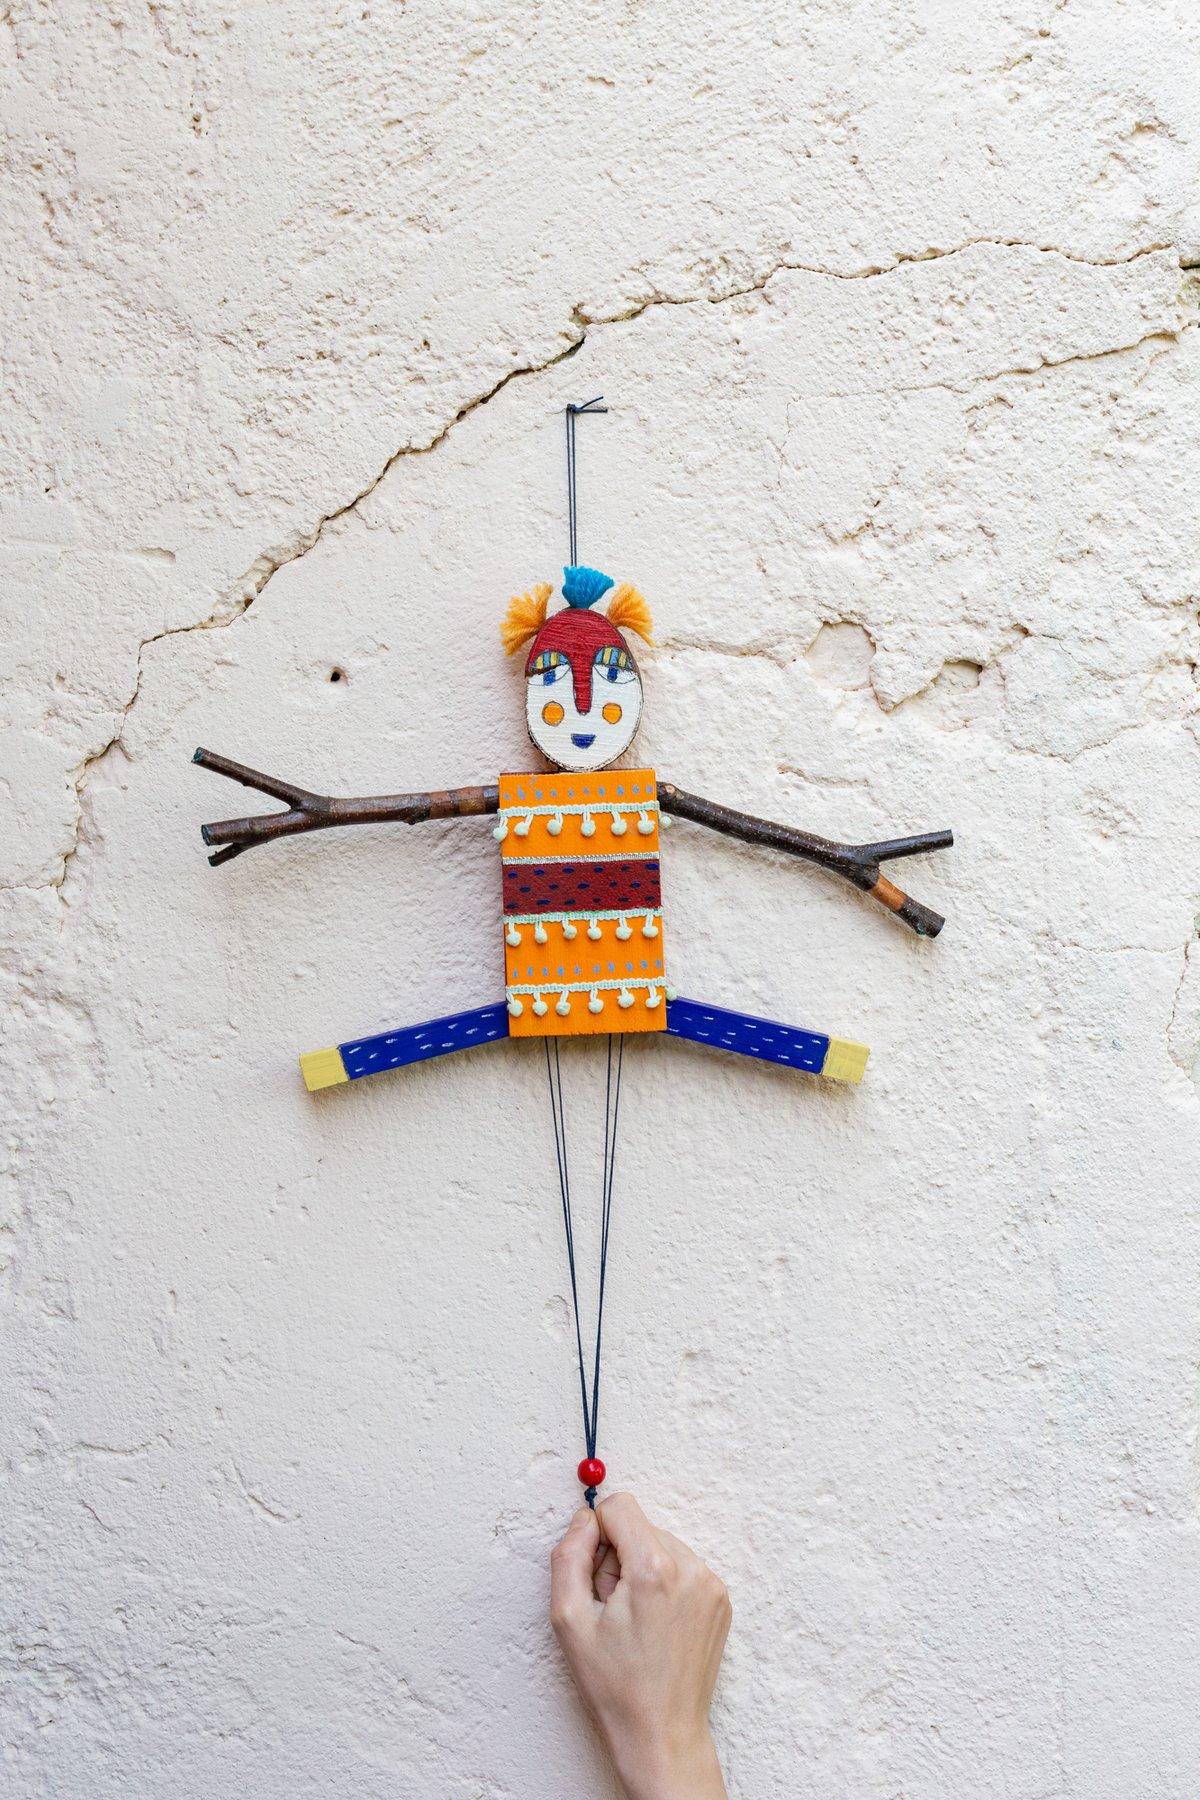 Image of Antonio / Freak puppet #13